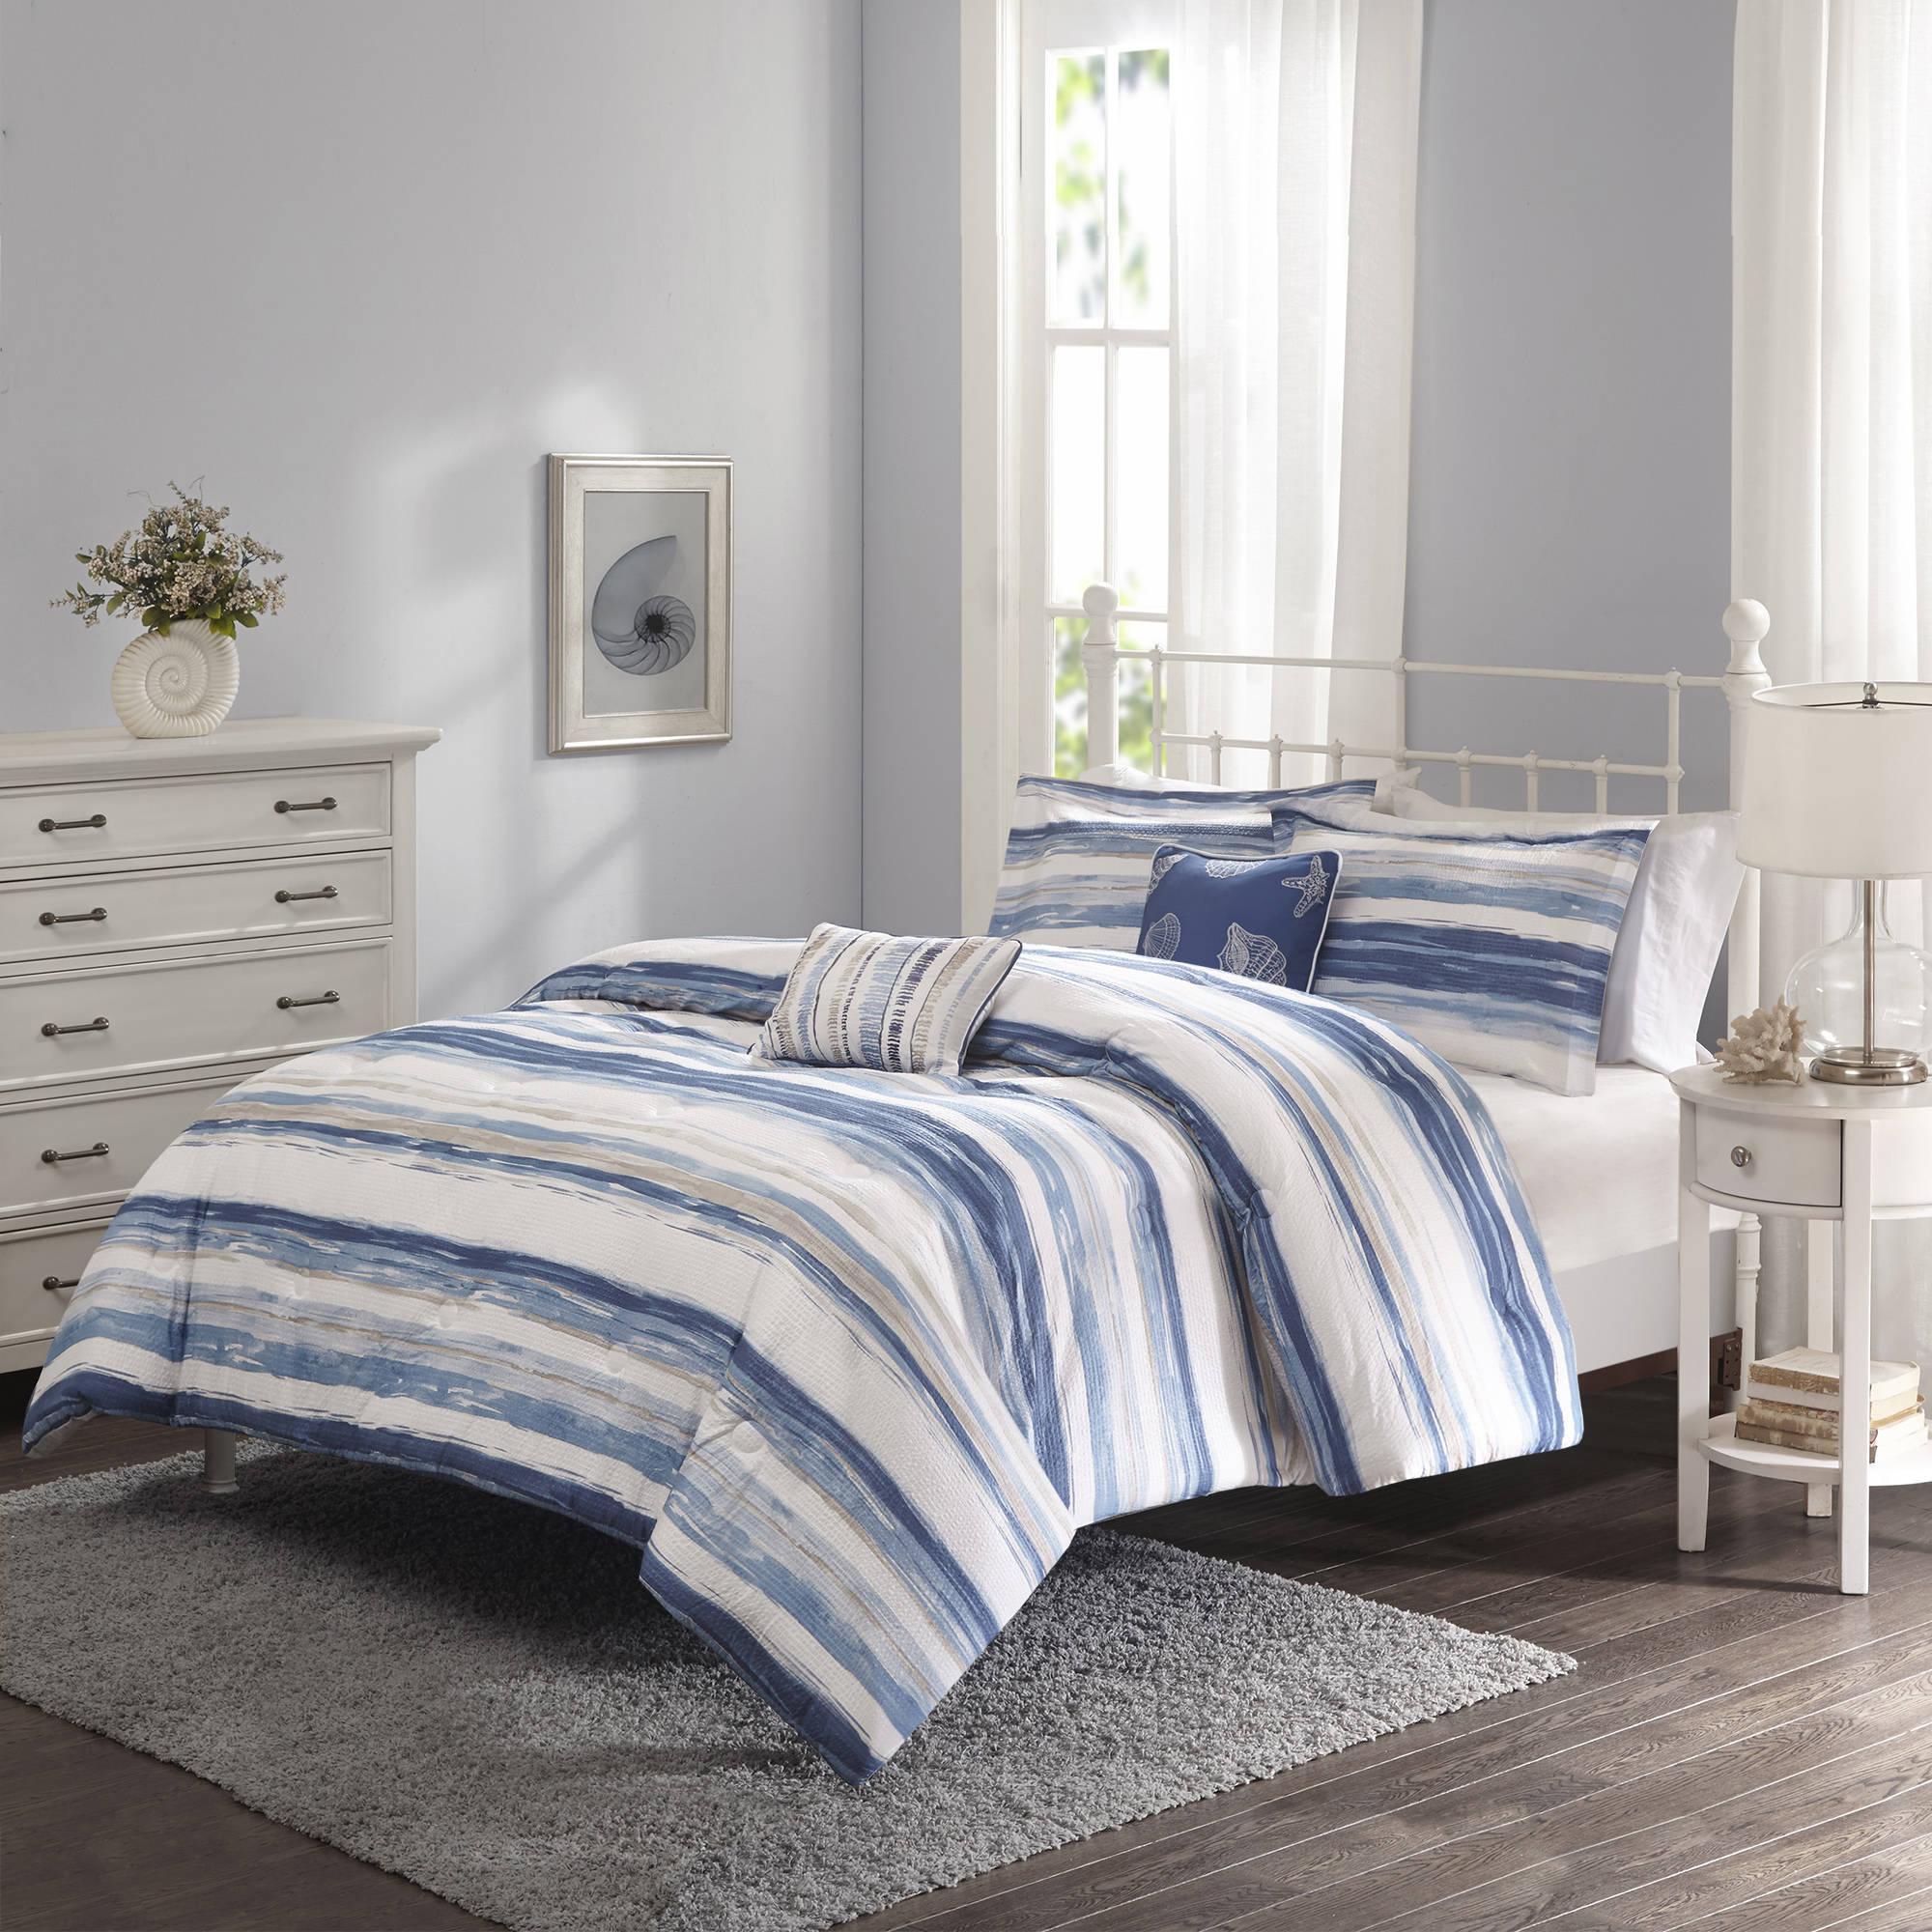 Better Homes and Gardens Blue Brushstroke Stripe 5-Piece Bedding Comforter Set